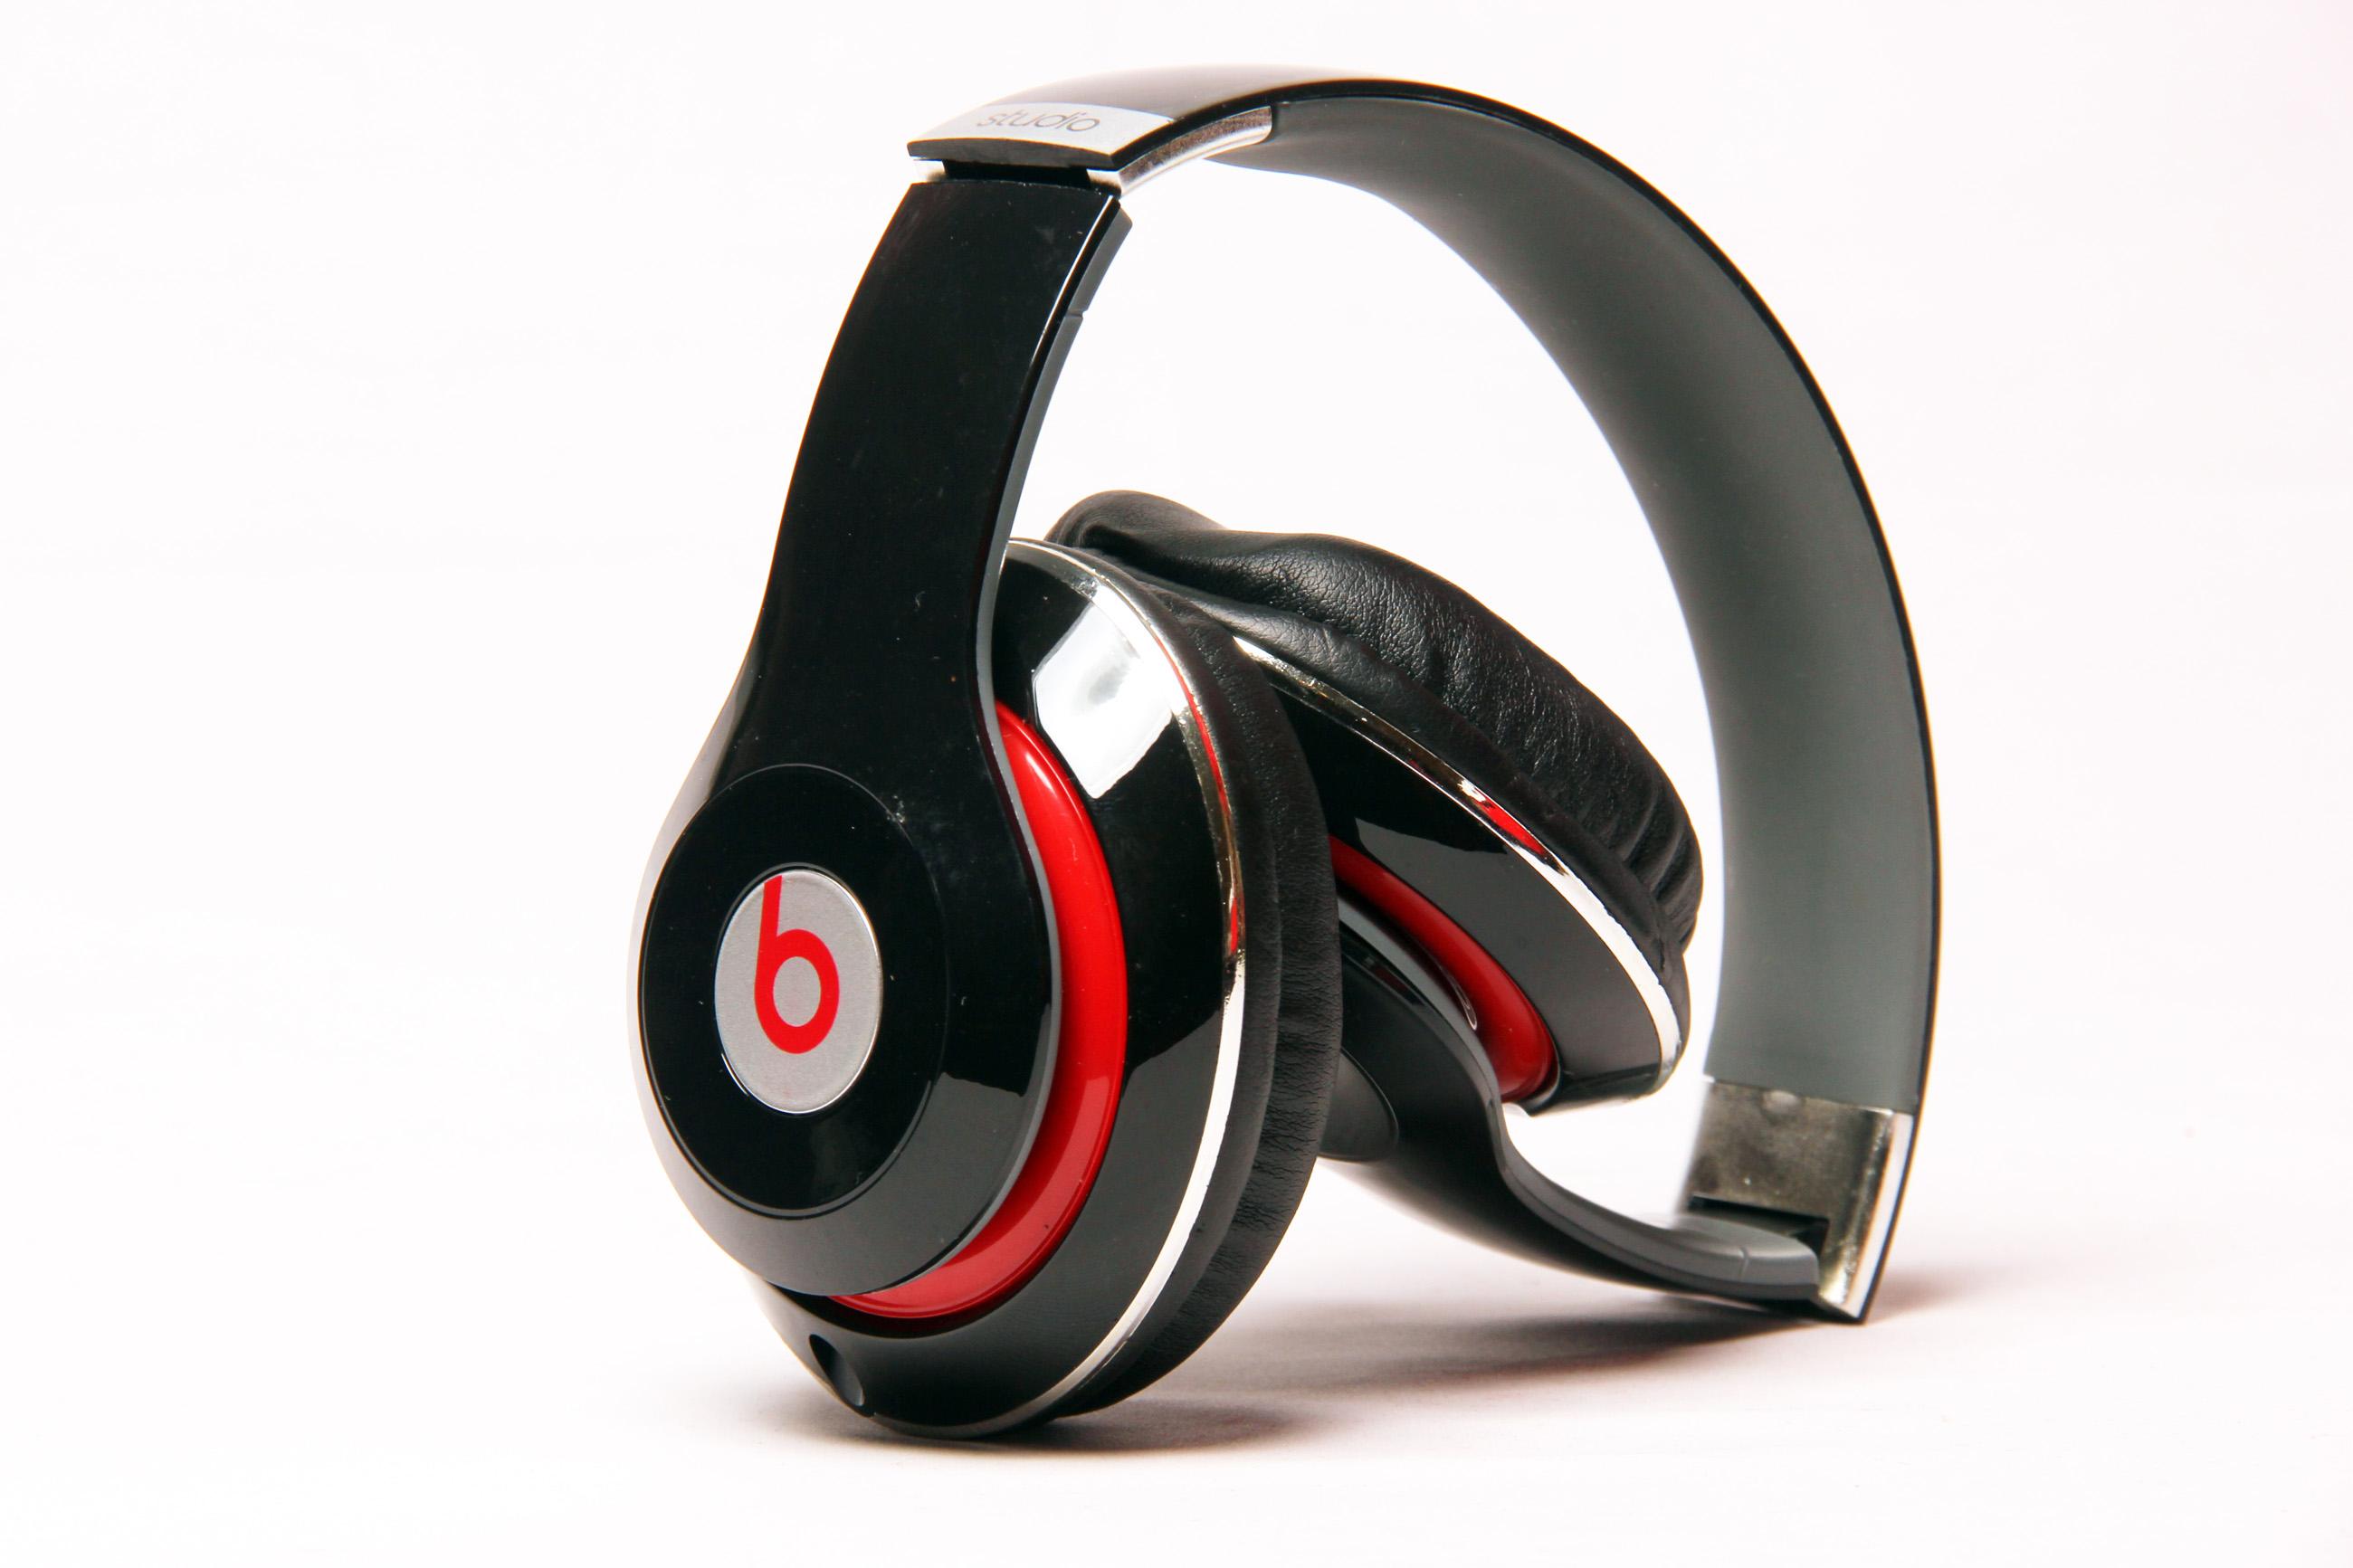 Silicon Studio TM 010 Bluetooth Stereo Wireless Headphones